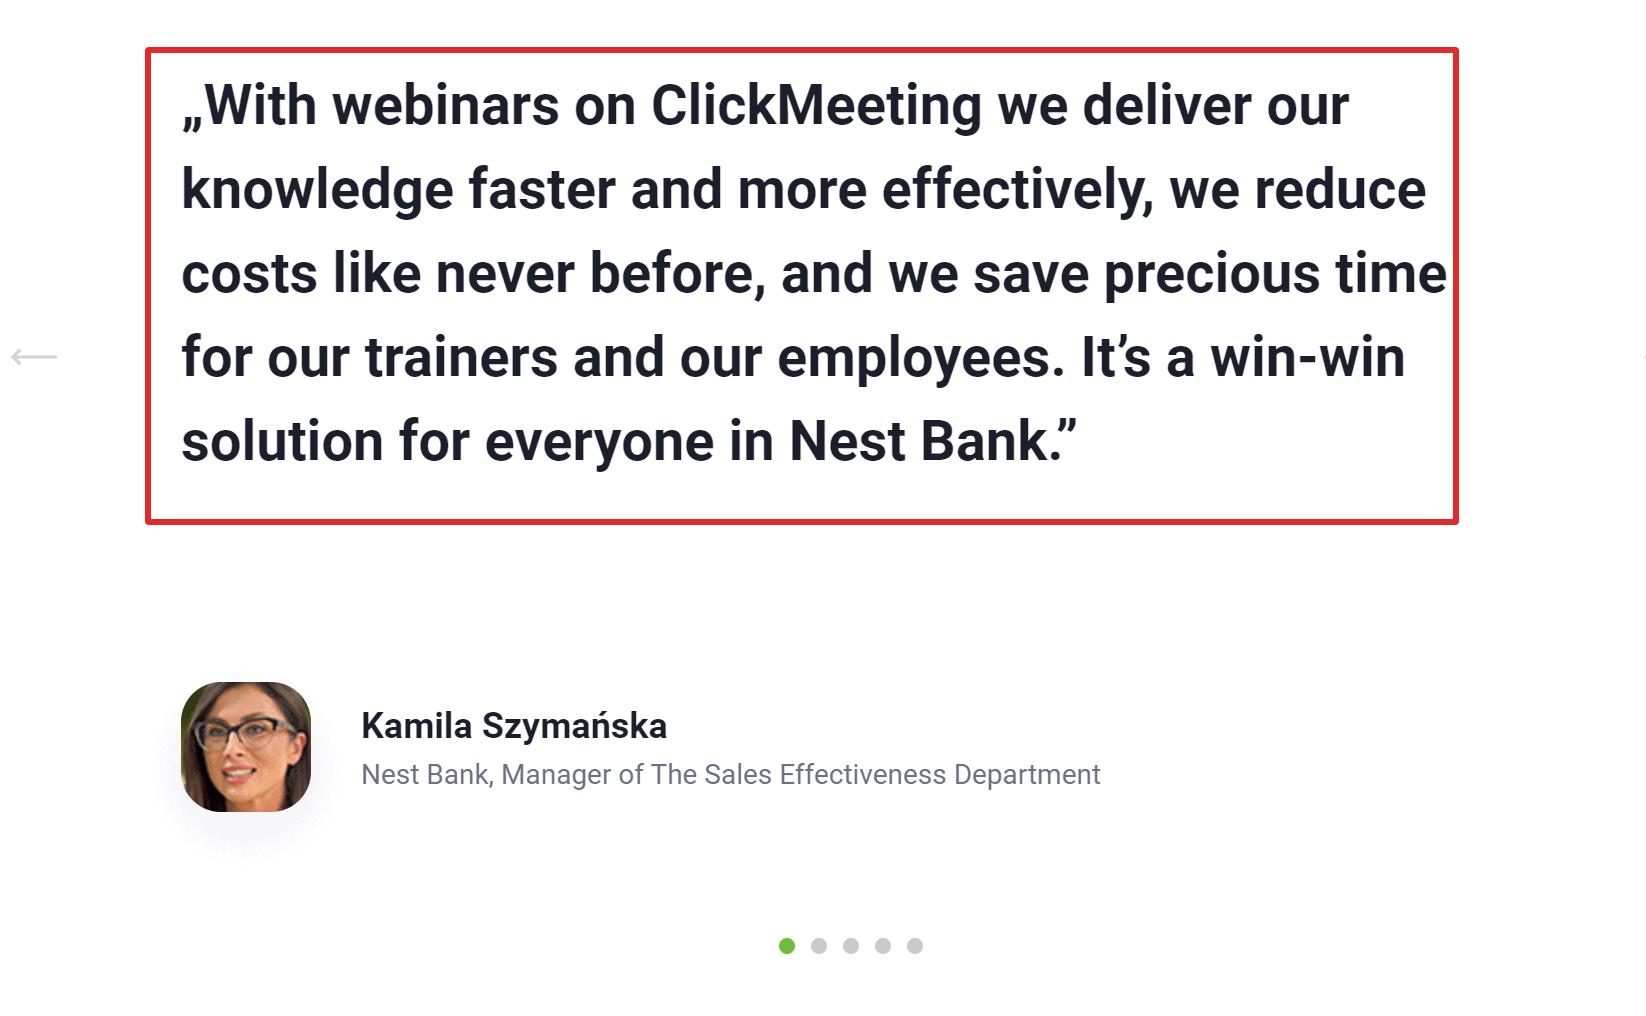 Clickmeeting testimonials online reviews